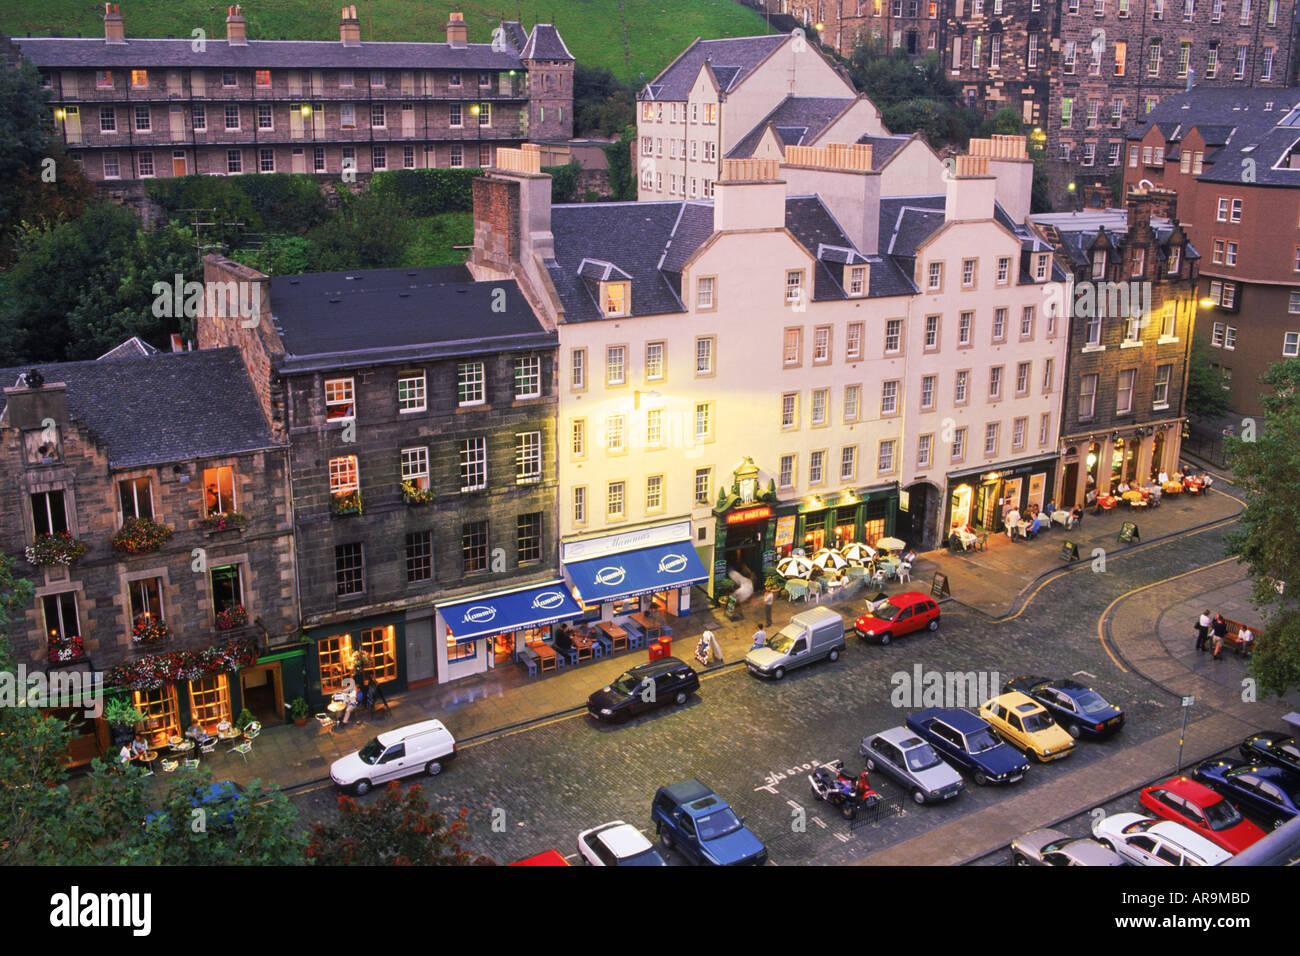 Cars parked at old pubs along Grassmarket in Edinburgh at dusk  Scotland - Stock Image